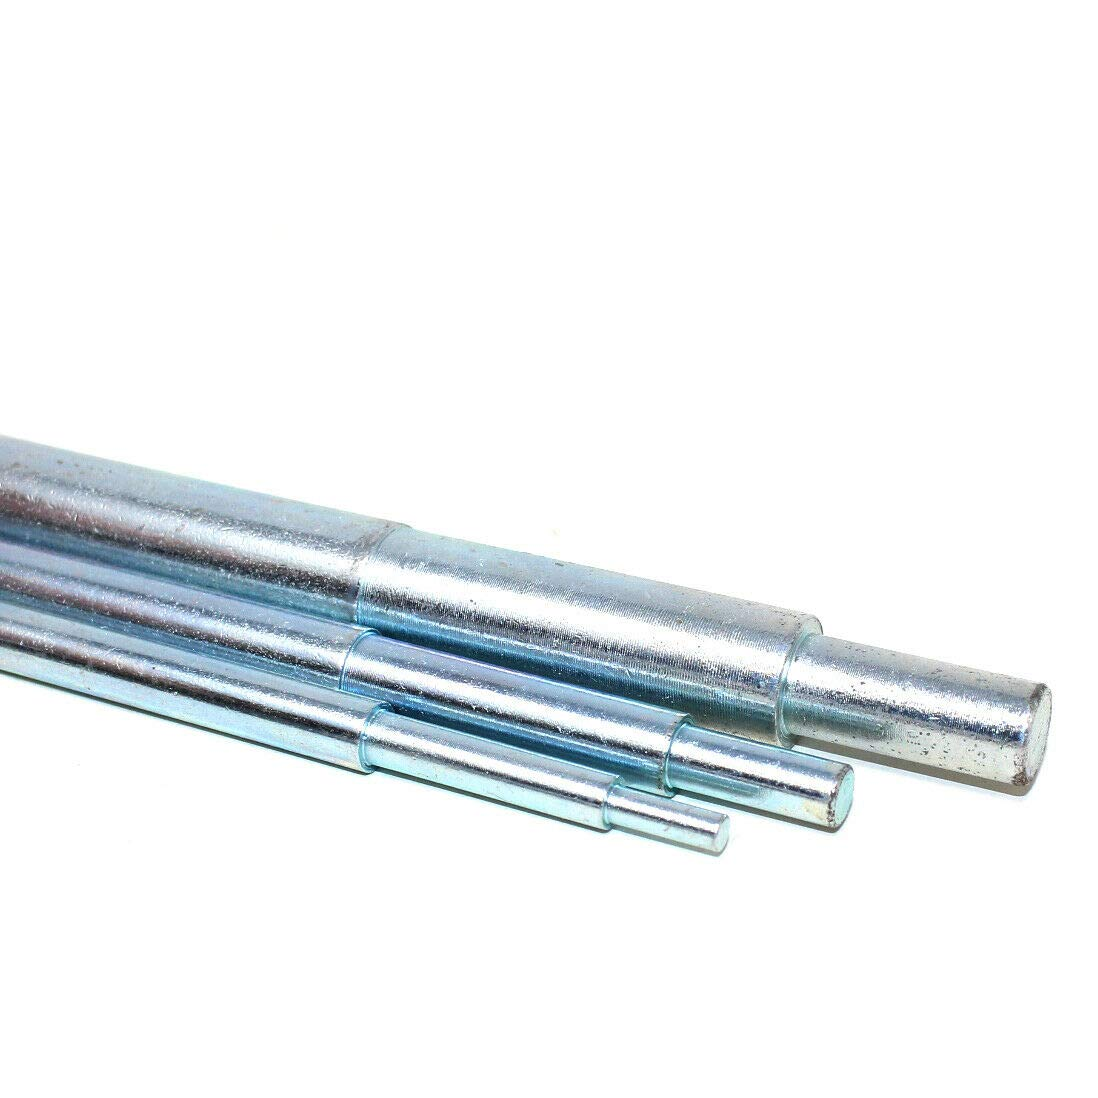 M6 Zinc Drop-in Anchor Setting Tool 1